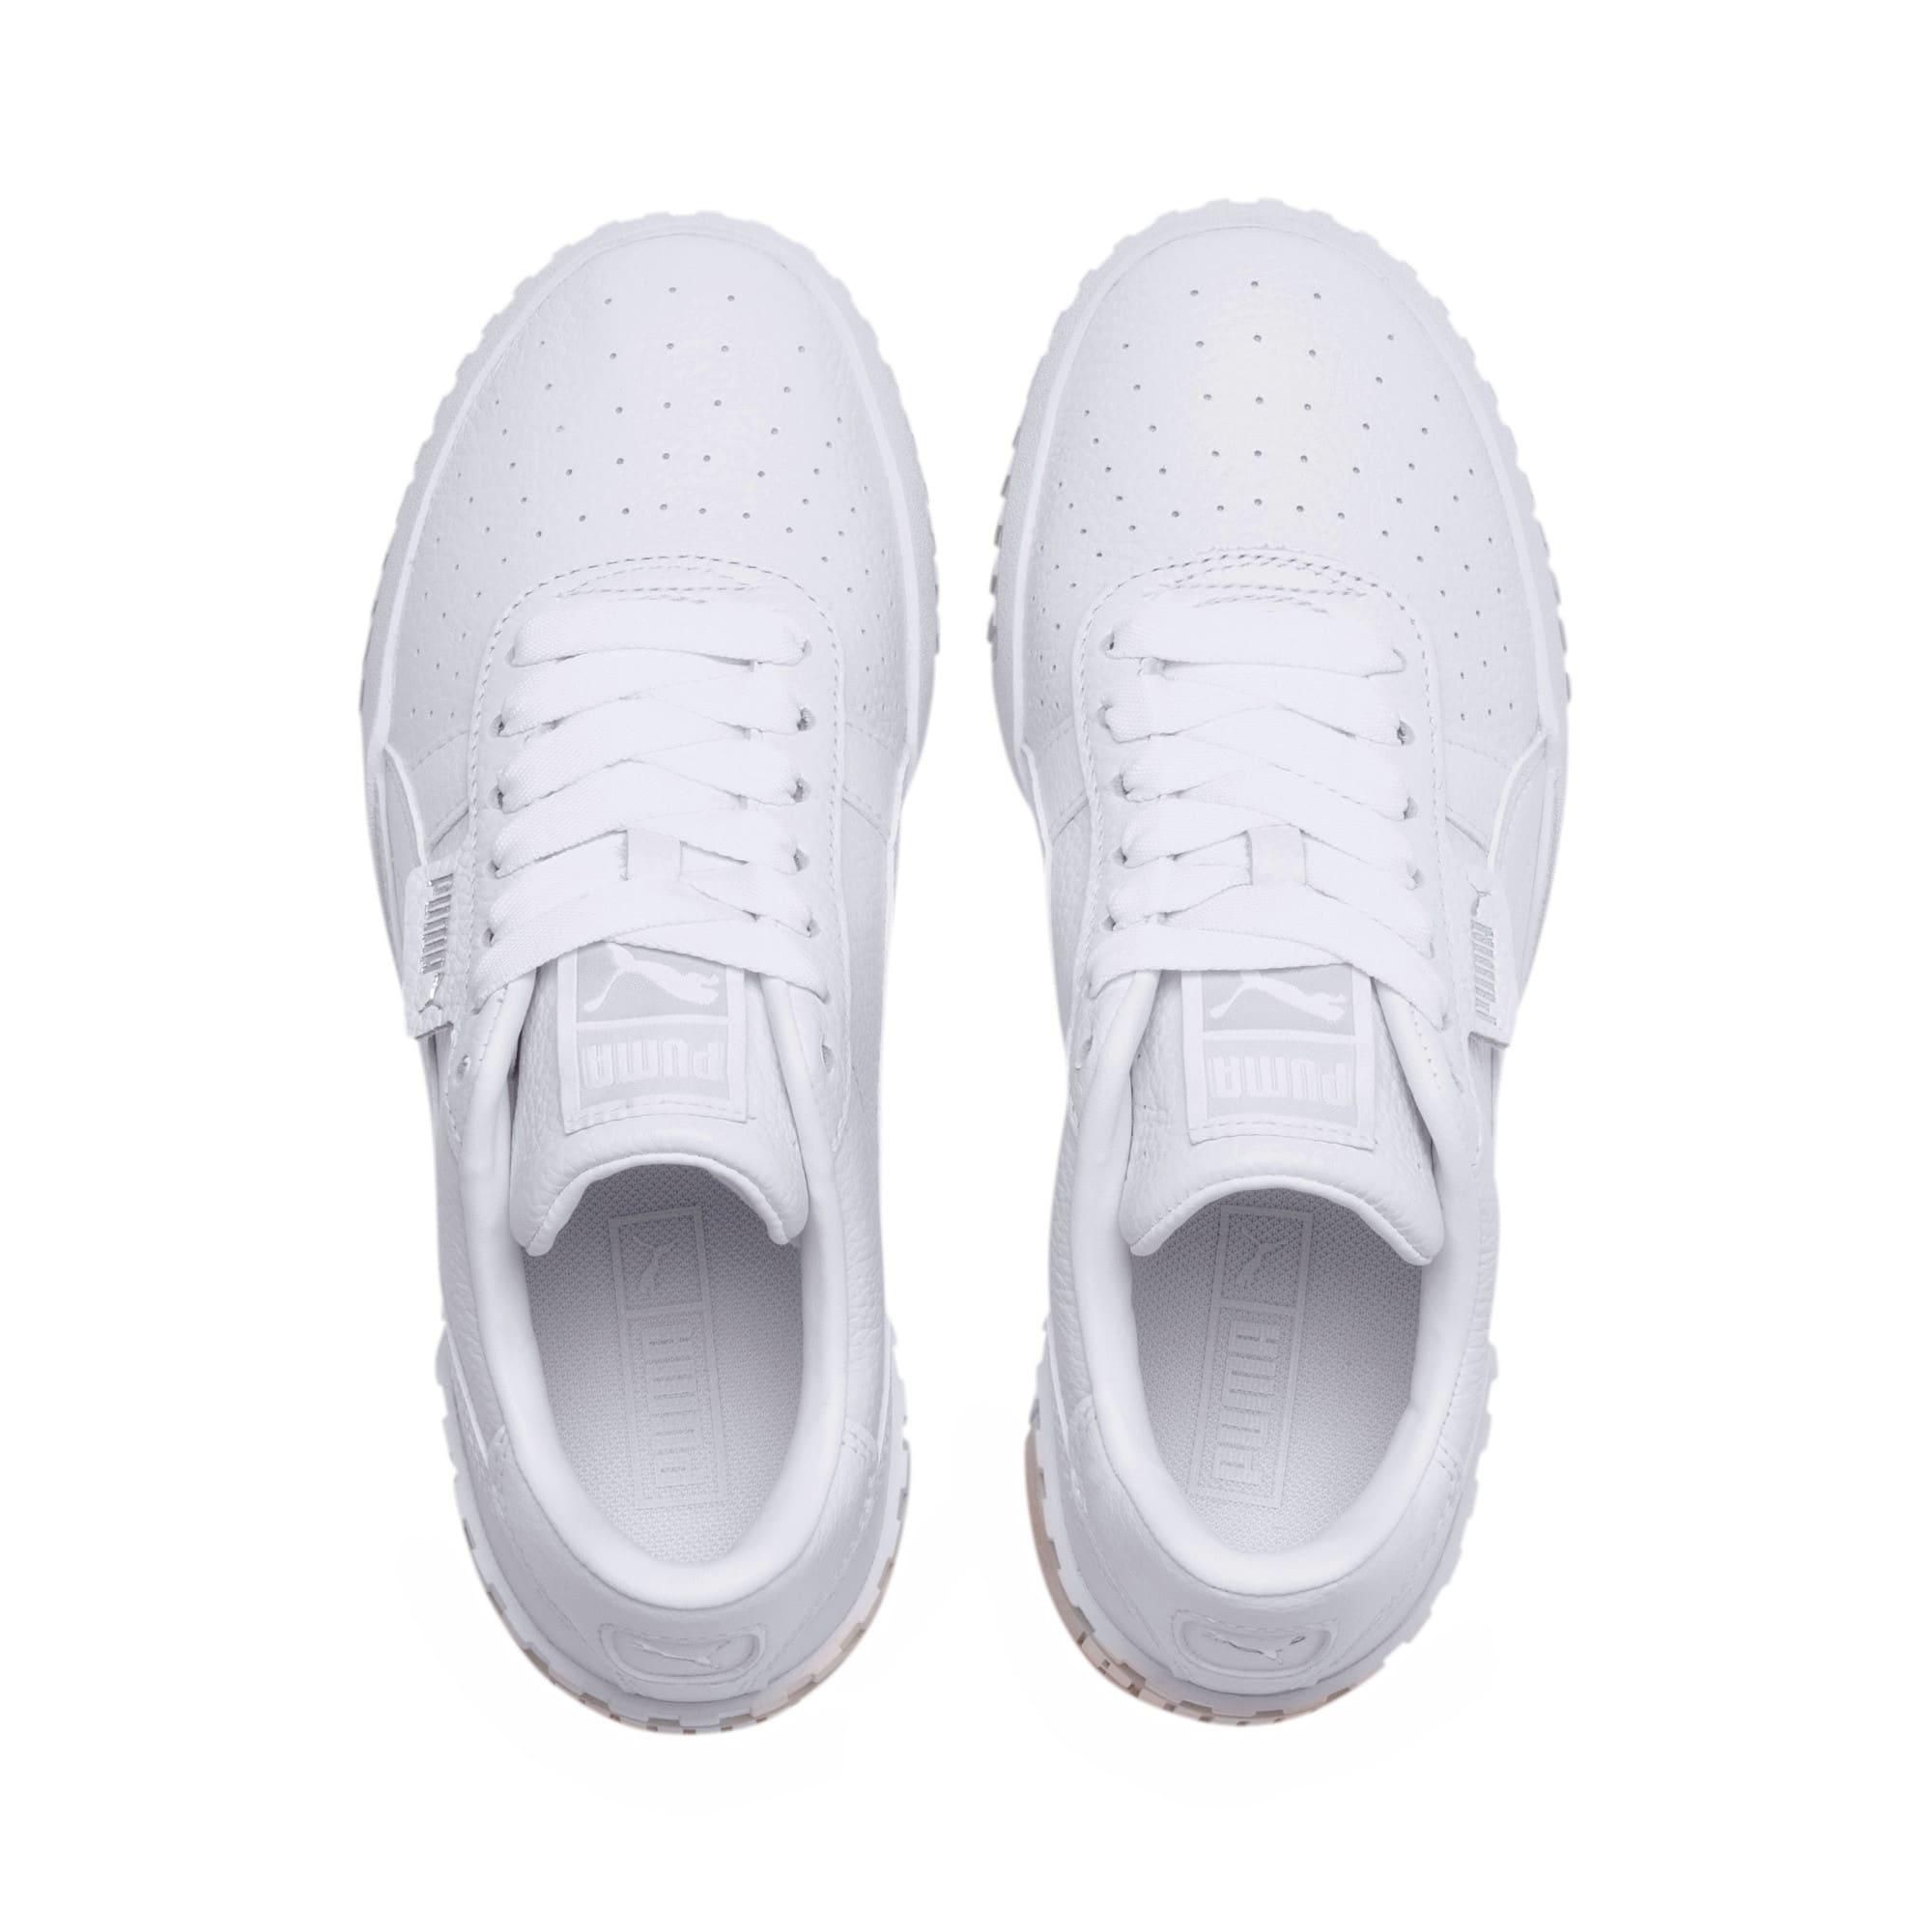 Imagen en miniatura 6 de Zapatillas de mujer Cali, Puma White-Whisper White, mediana